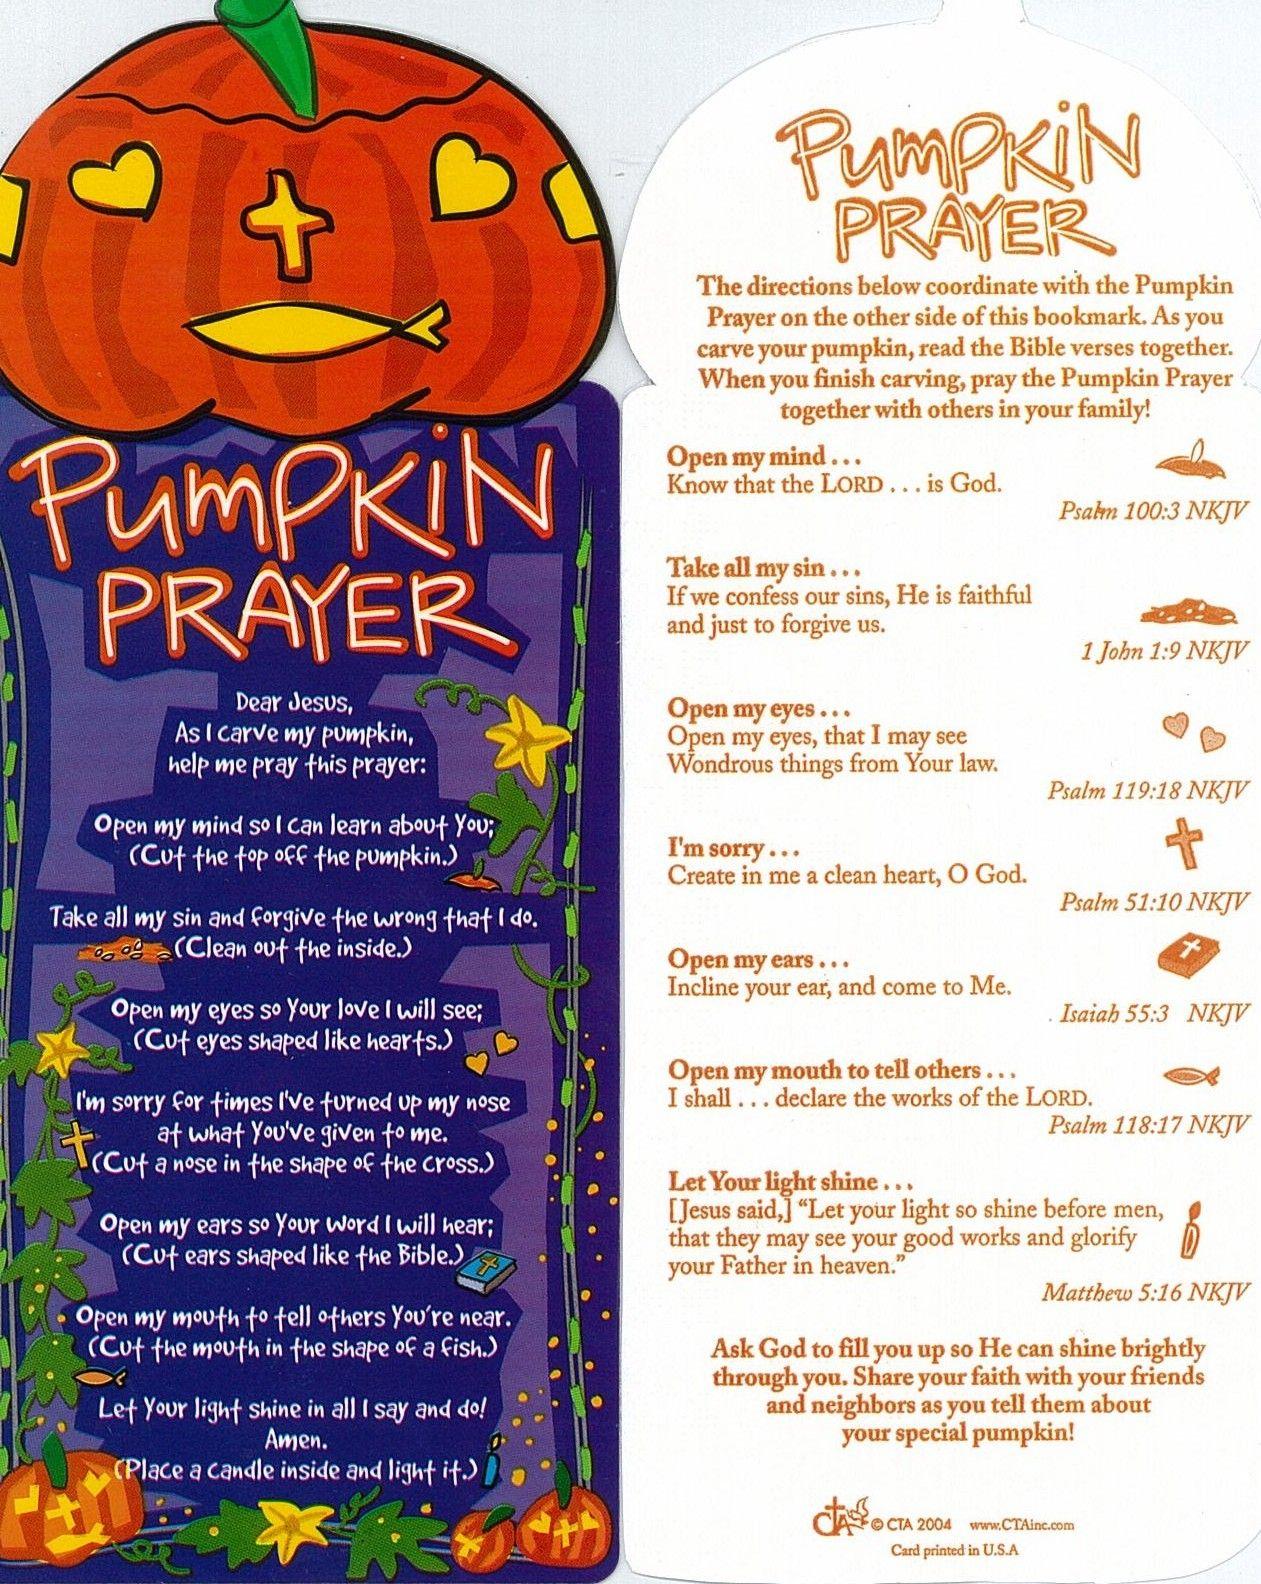 Pumpkin Prayer To Accompany Carving